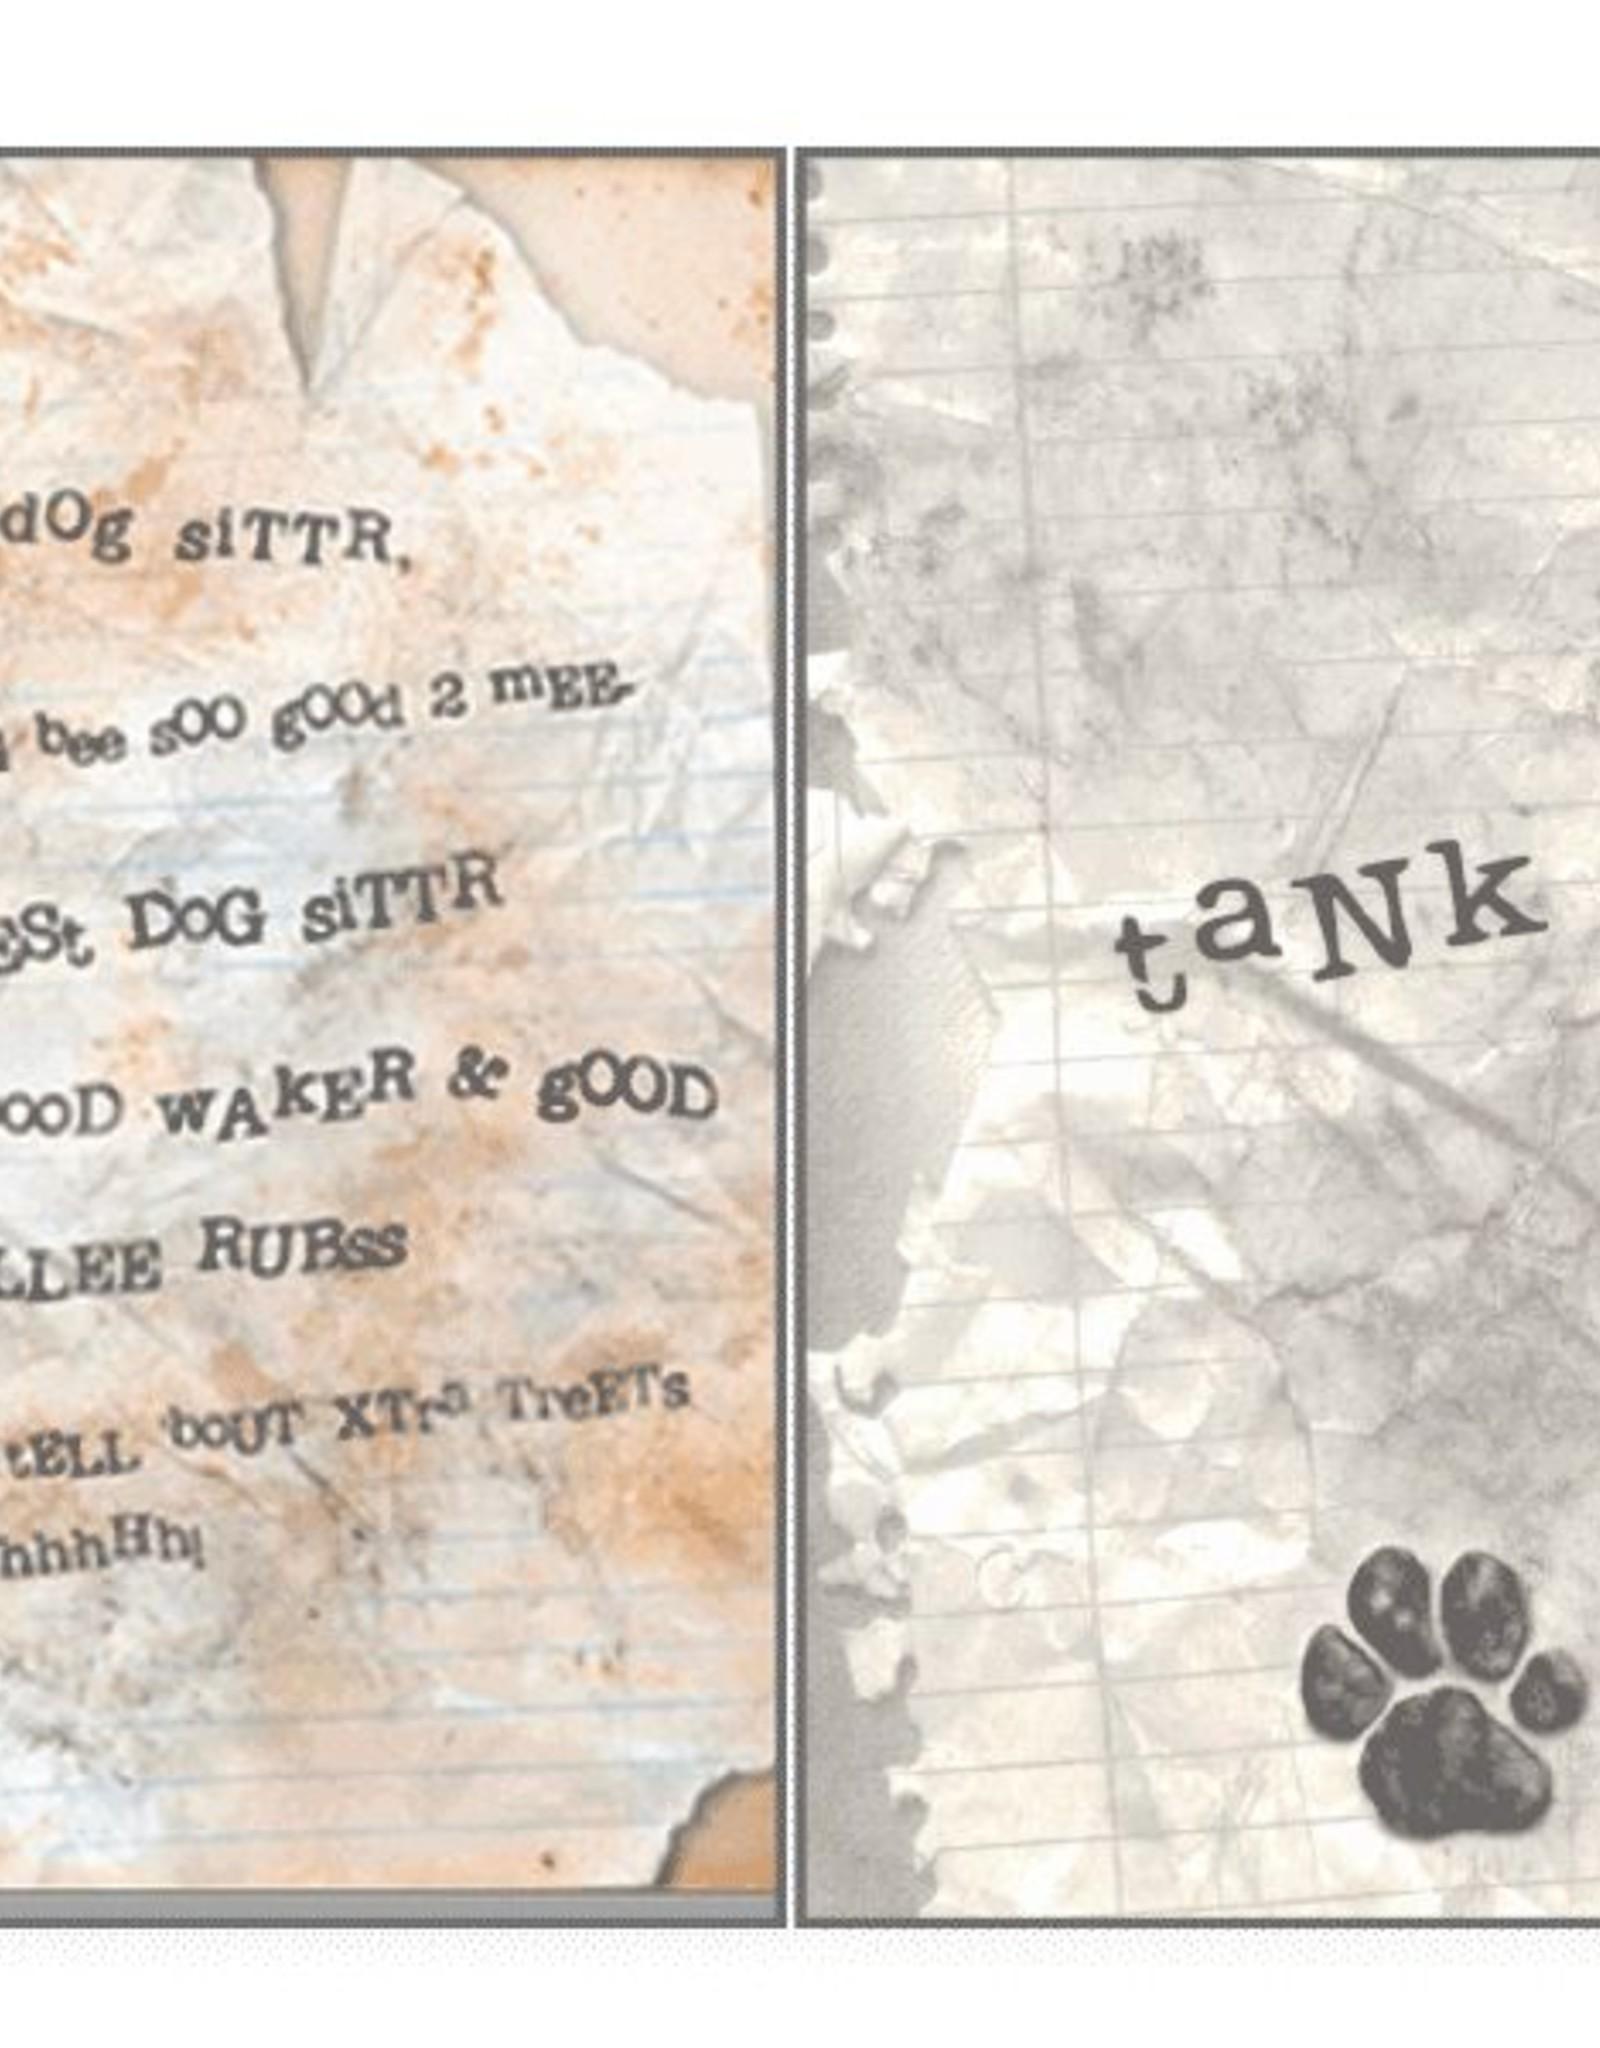 Dog Speak Dog Speak Card - Pet Sitter - Dog Sitter Letter